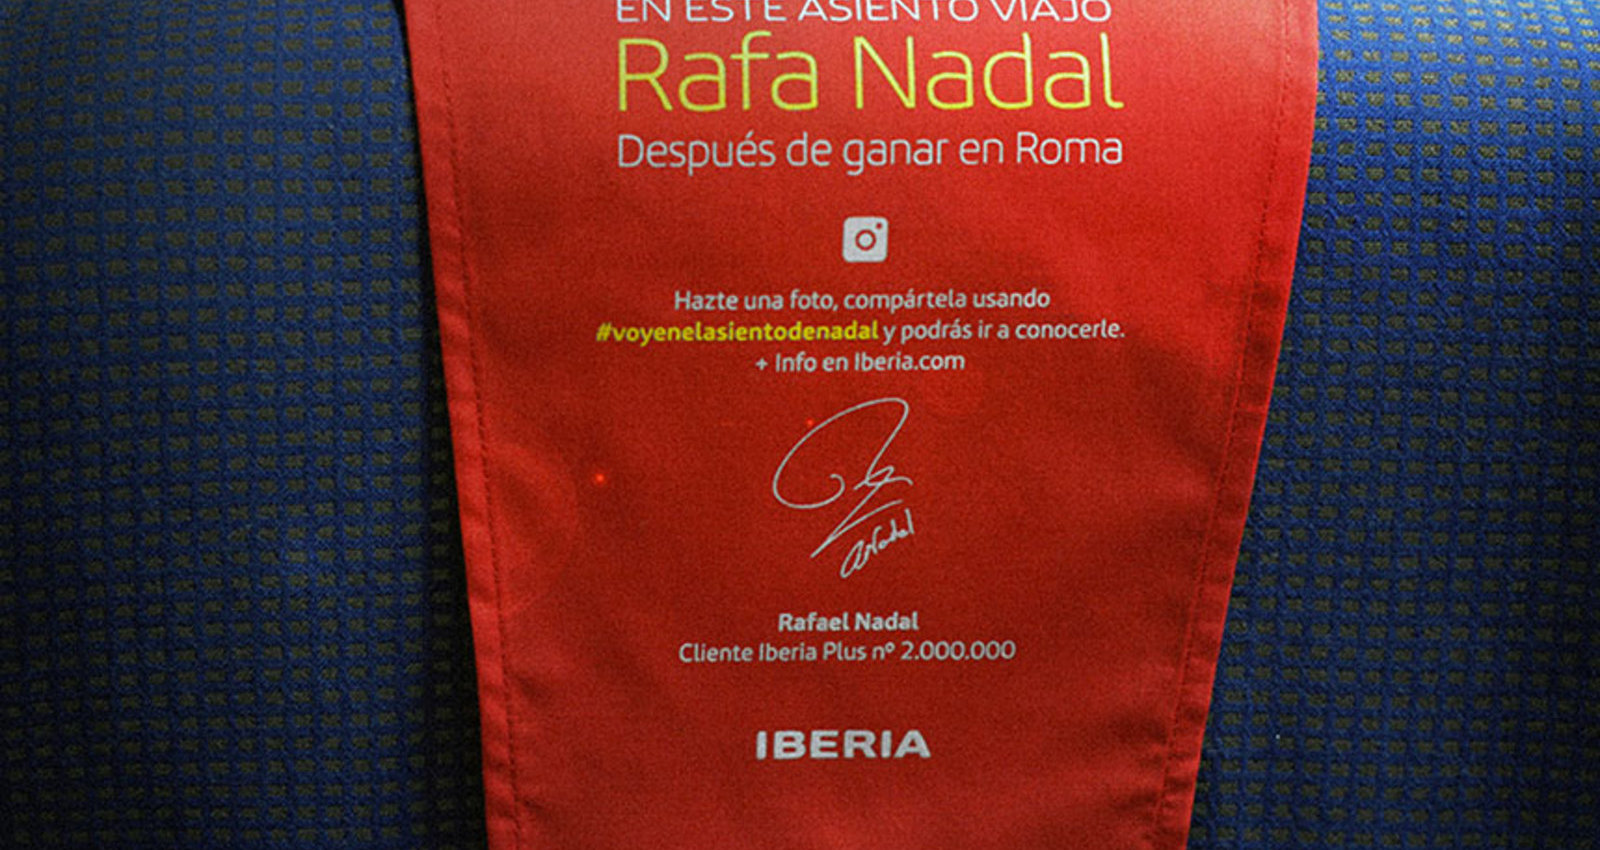 RAFA NADAL'S SEAT